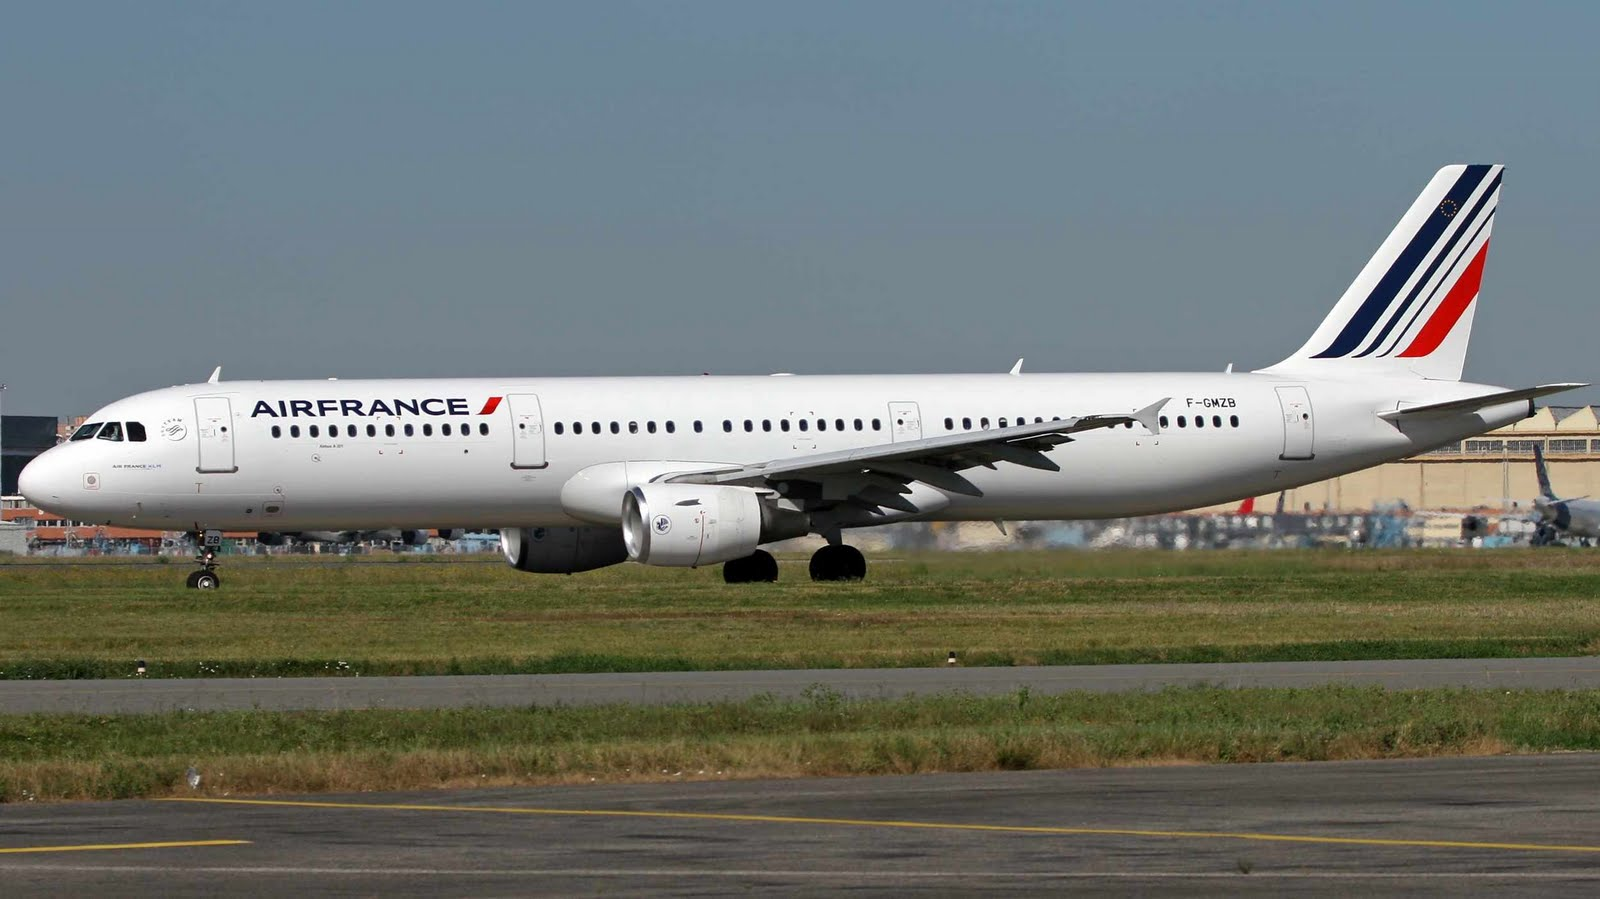 Air France Airbus A321 on Runway Wallpaper 753   AERONEFNET 1600x899